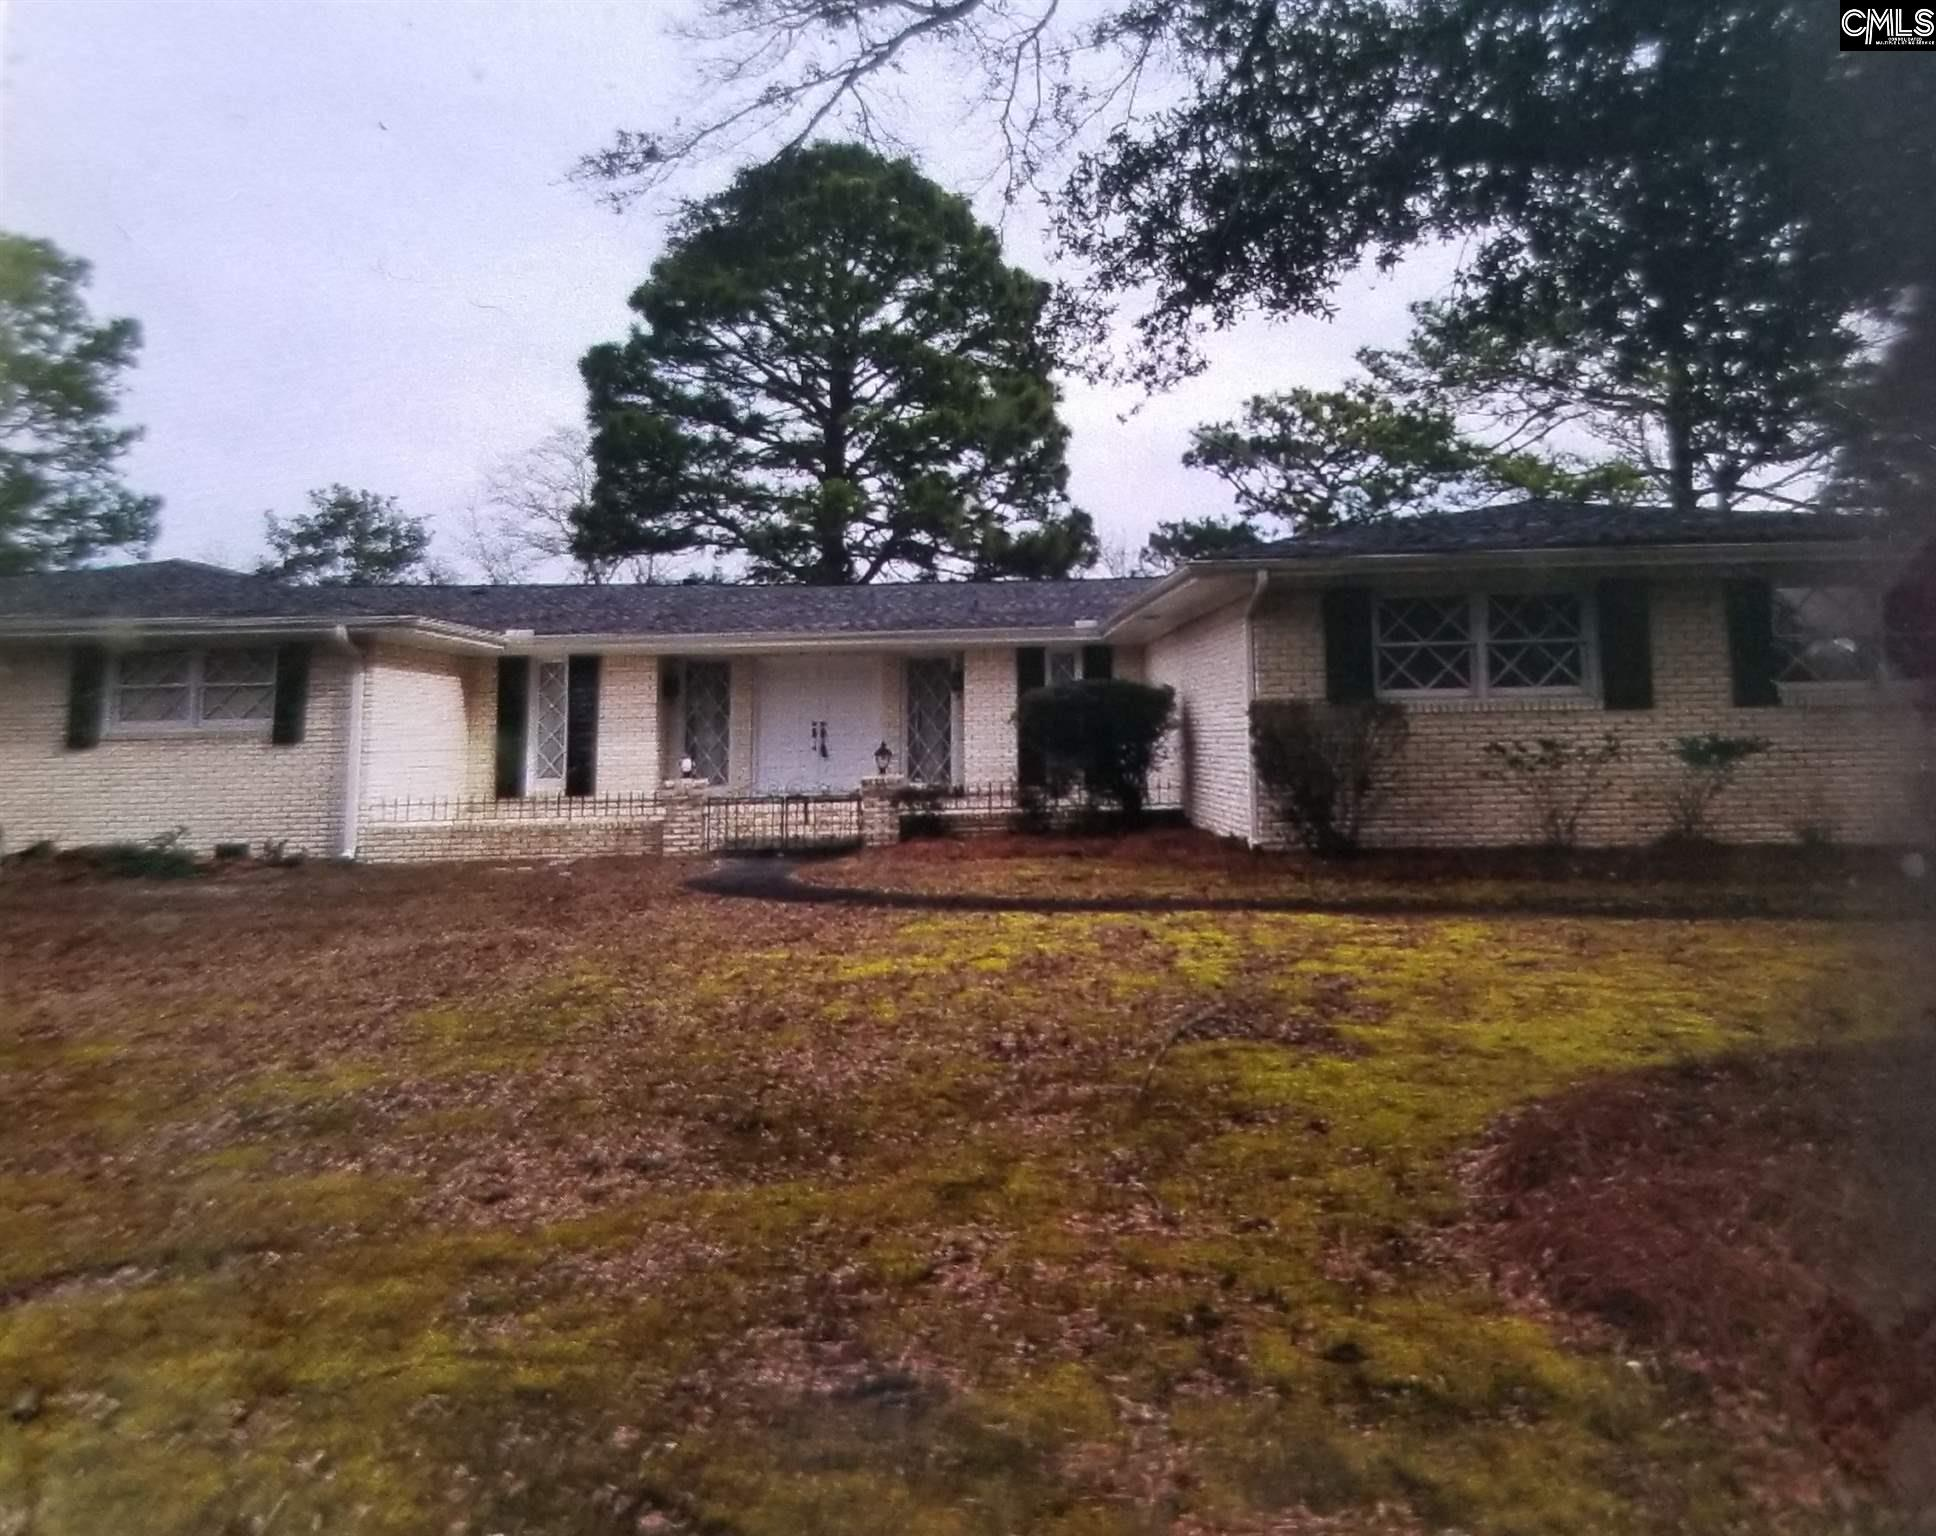 125 W. Parkshore Columbia, SC 29229